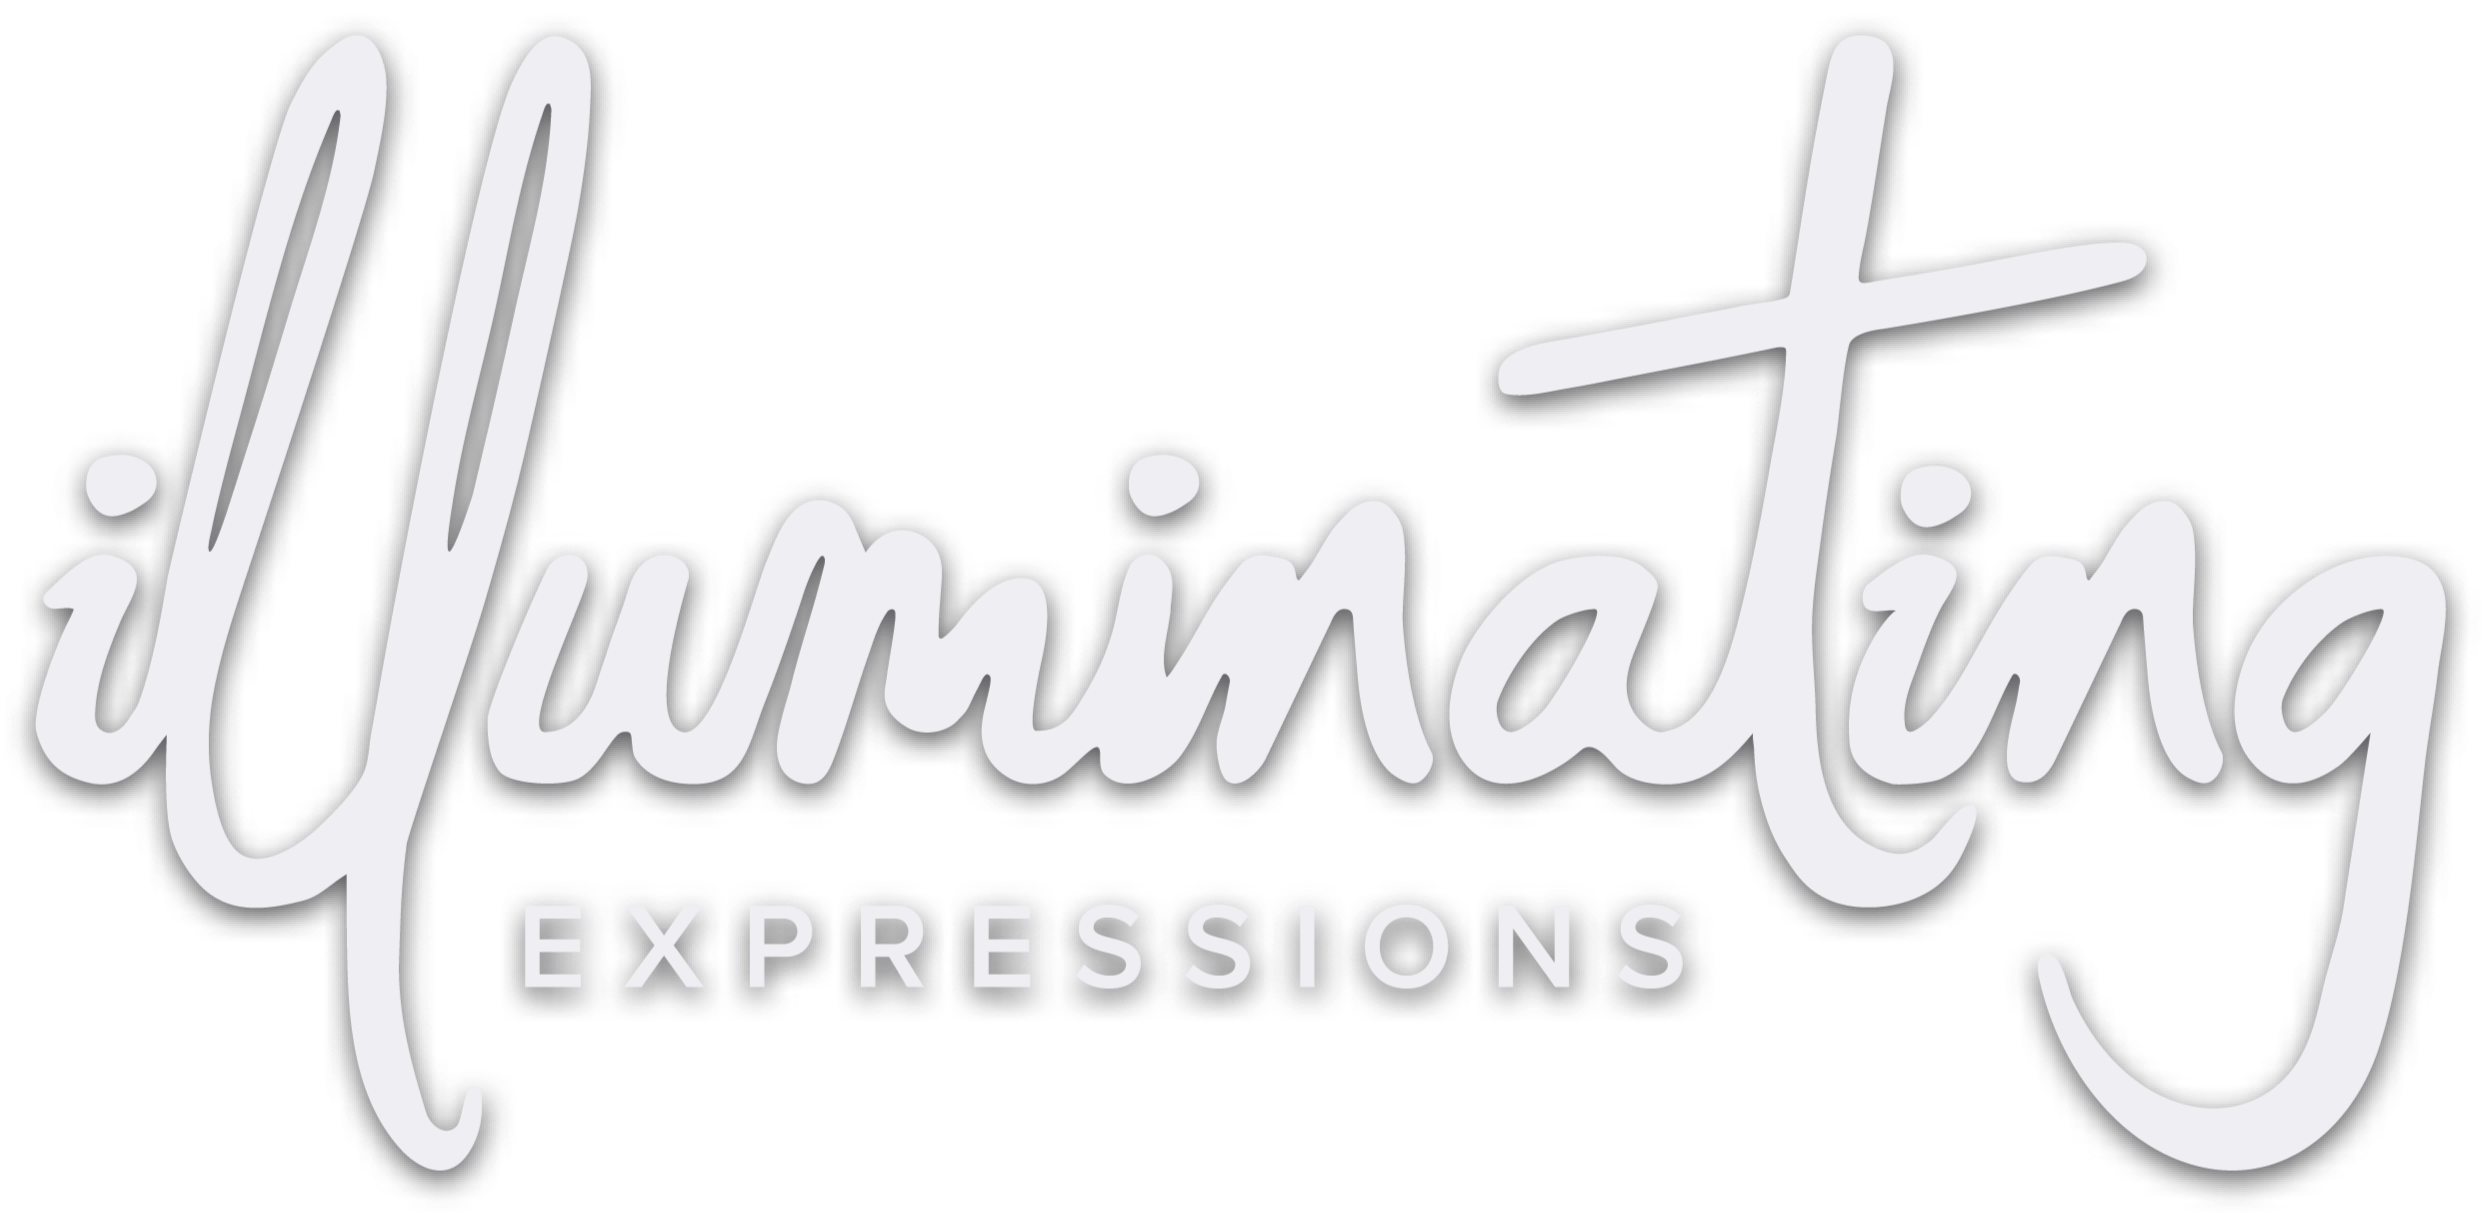 Illuminating Expressions